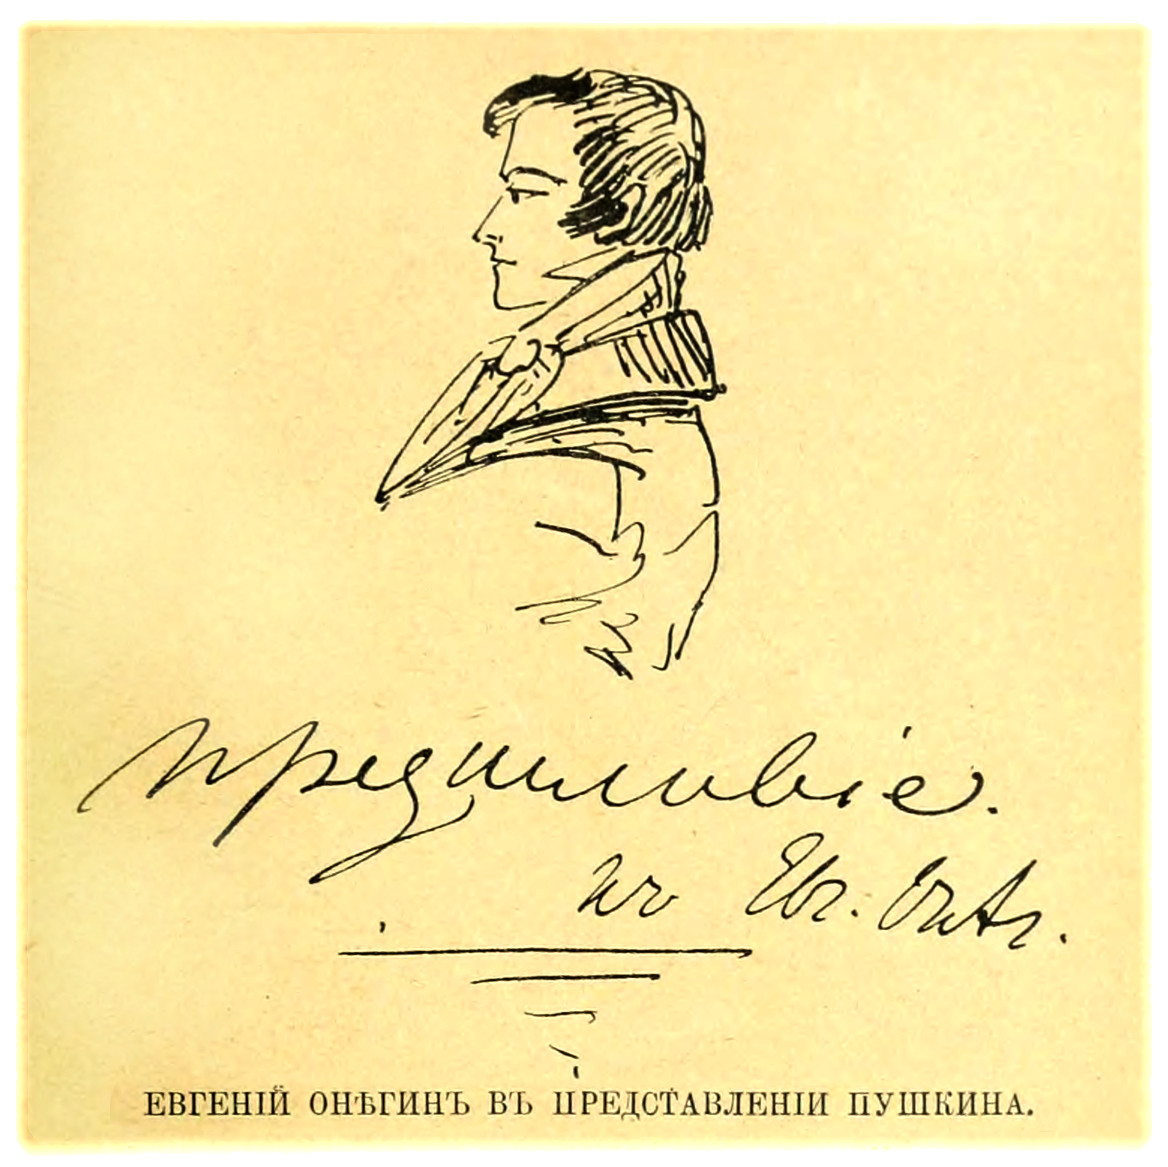 пушкин и онегин знакомы